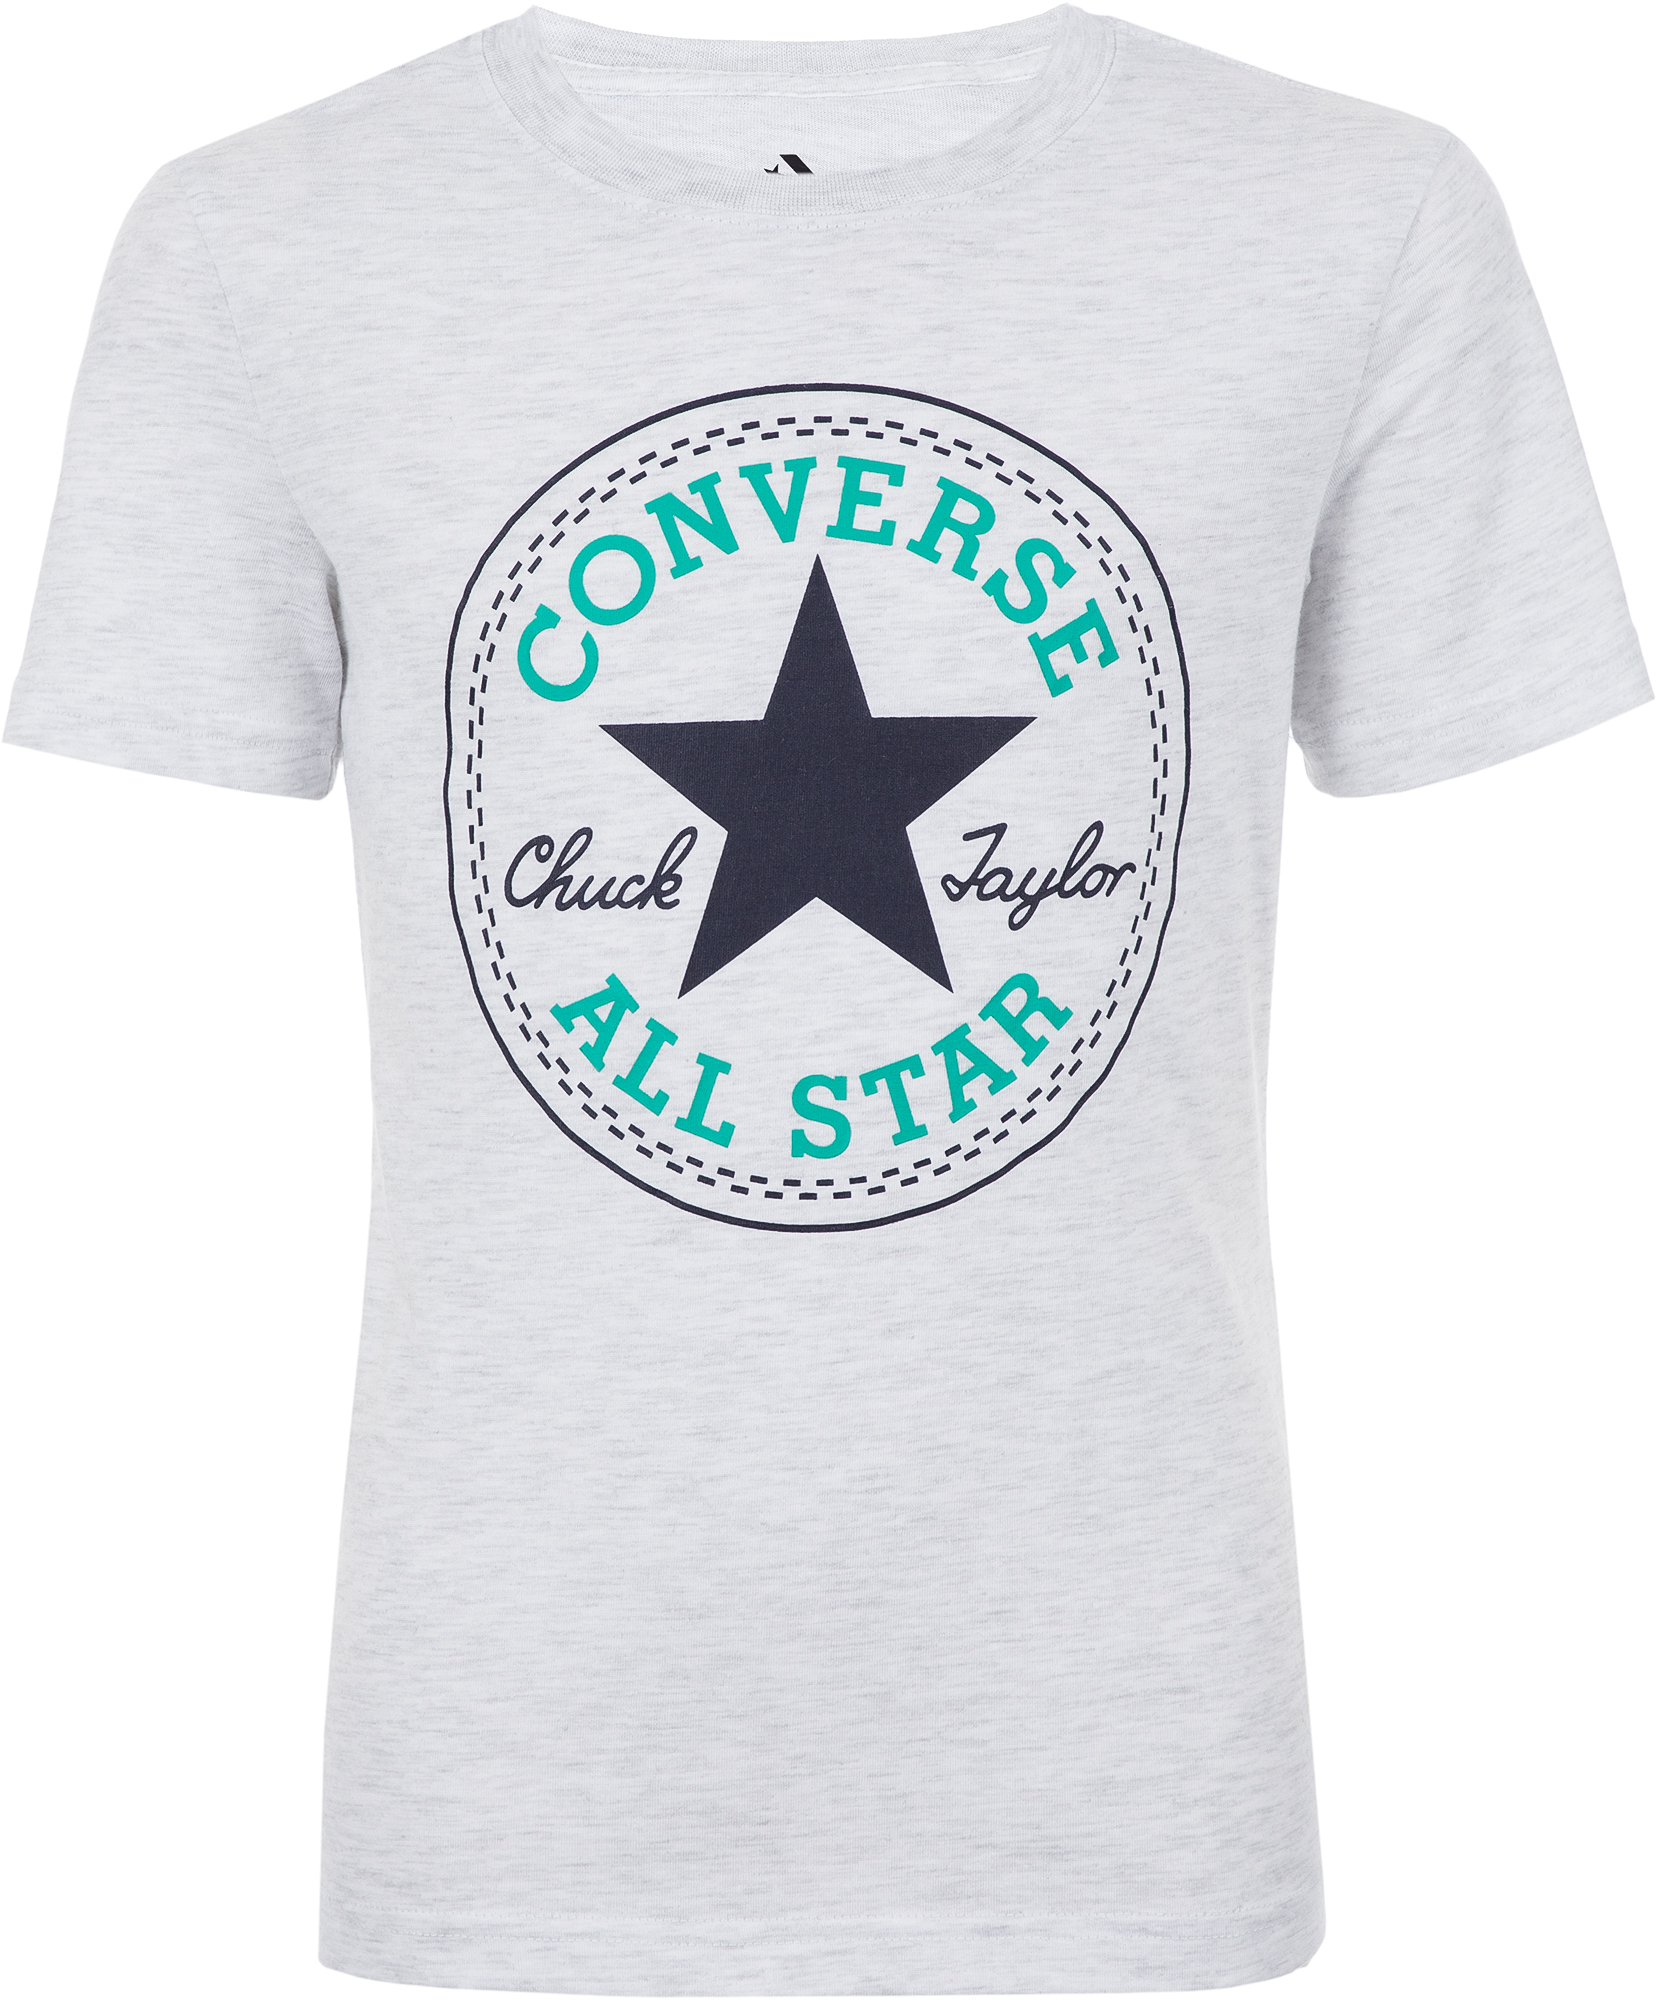 Converse Футболка для мальчиков Converse Chuck Patch, размер 164